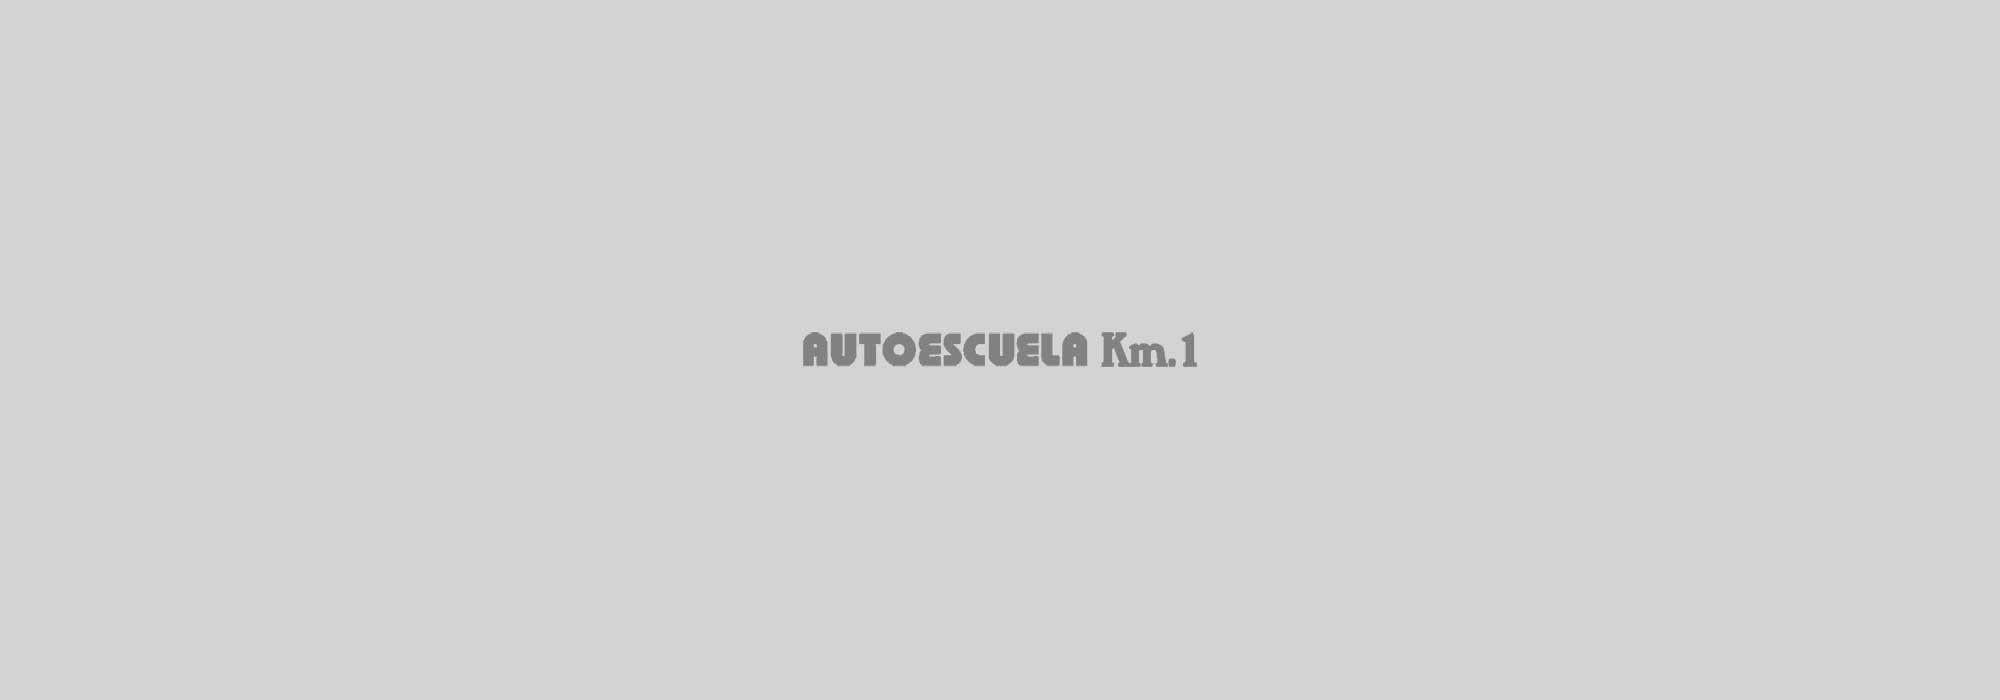 autoescuelakm1_imagen